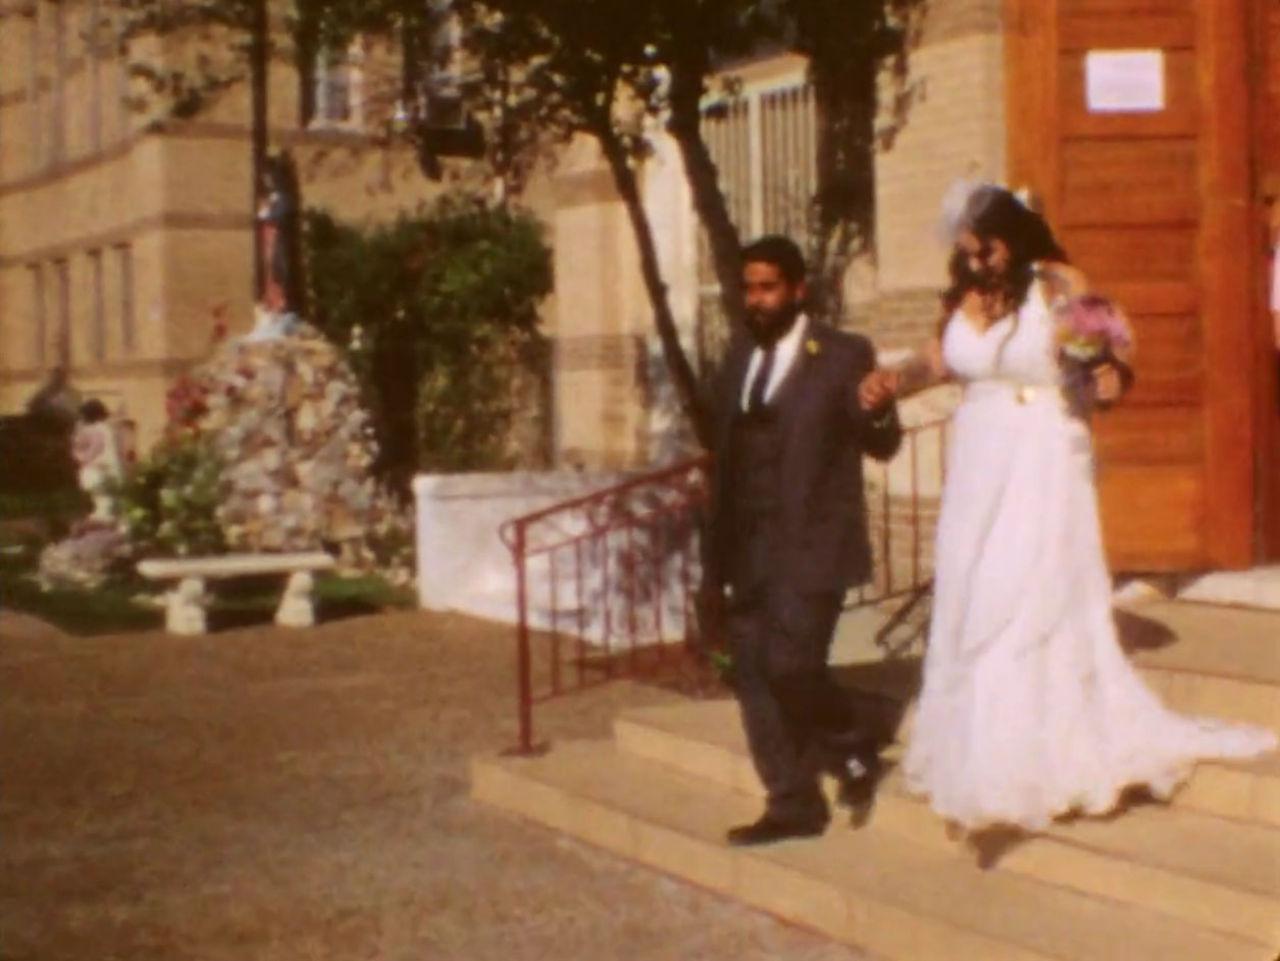 Jessica & Anthony | Super 8 Film | Wedding Cinematography San Antonio, Texas | DIY Bride